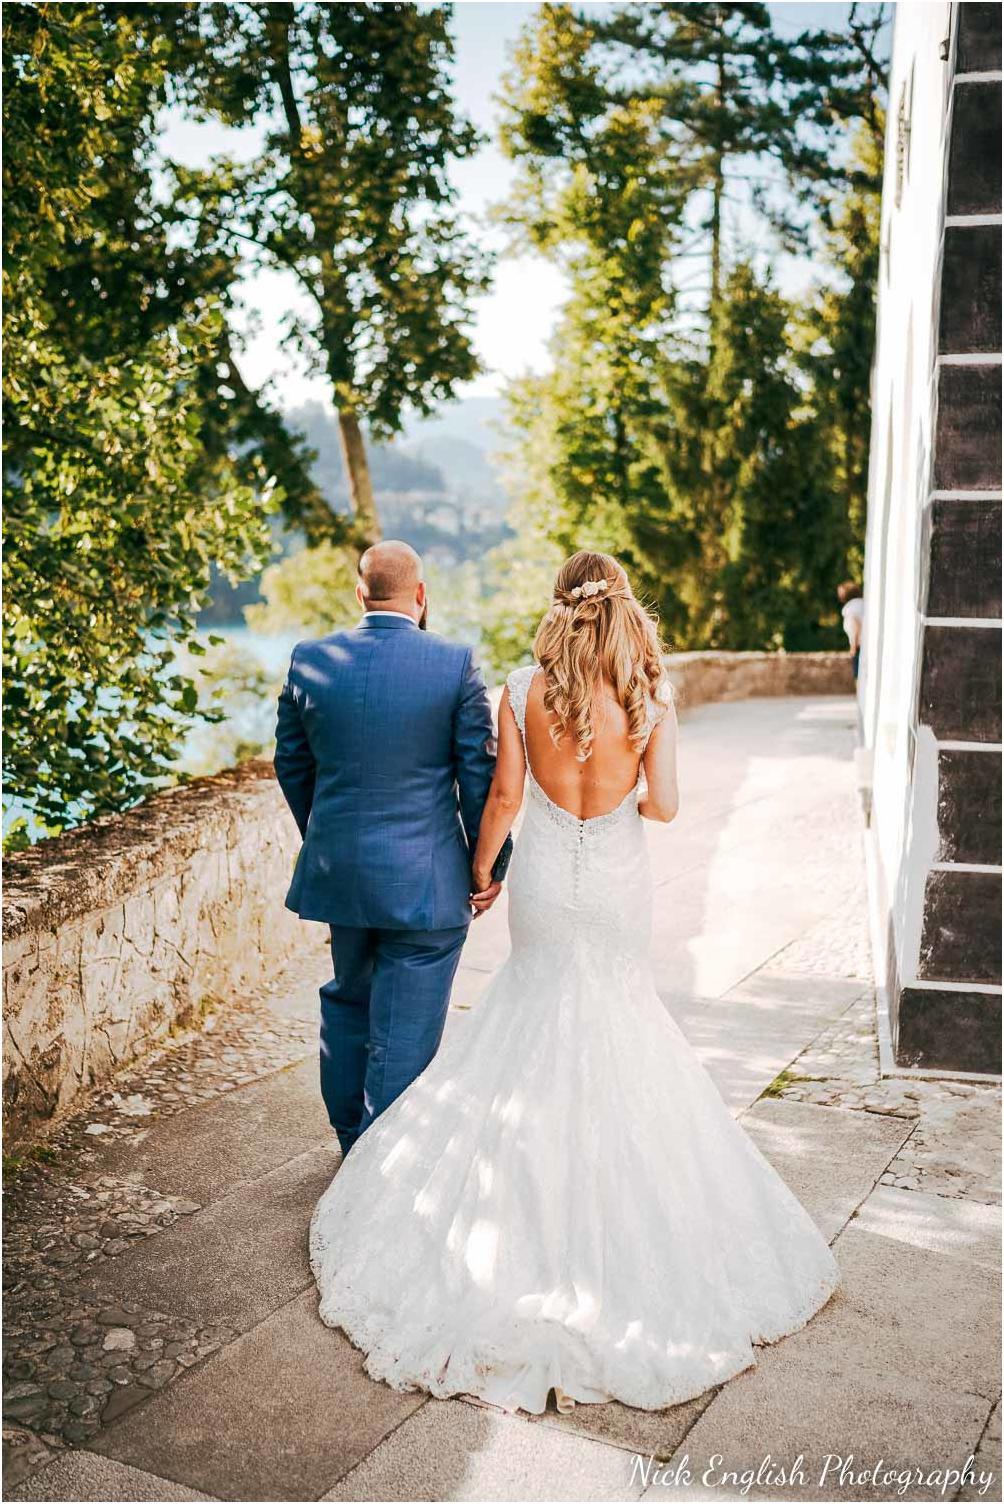 Destination_Wedding_Photographer_Slovenia_Nick_English_Photography-70-20.jpg